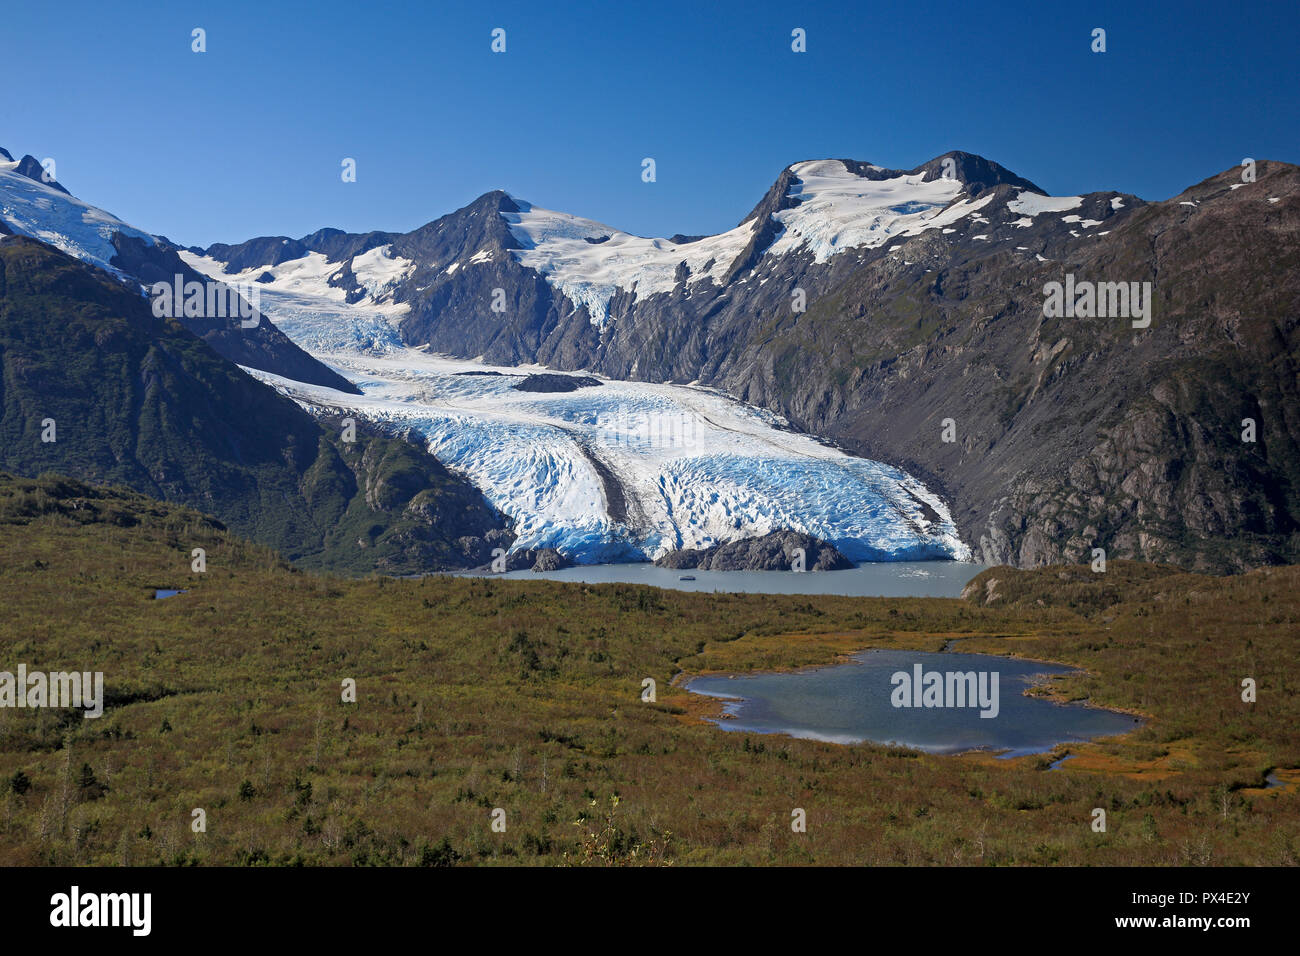 View of the Portage Glacier Alaska - Stock Image